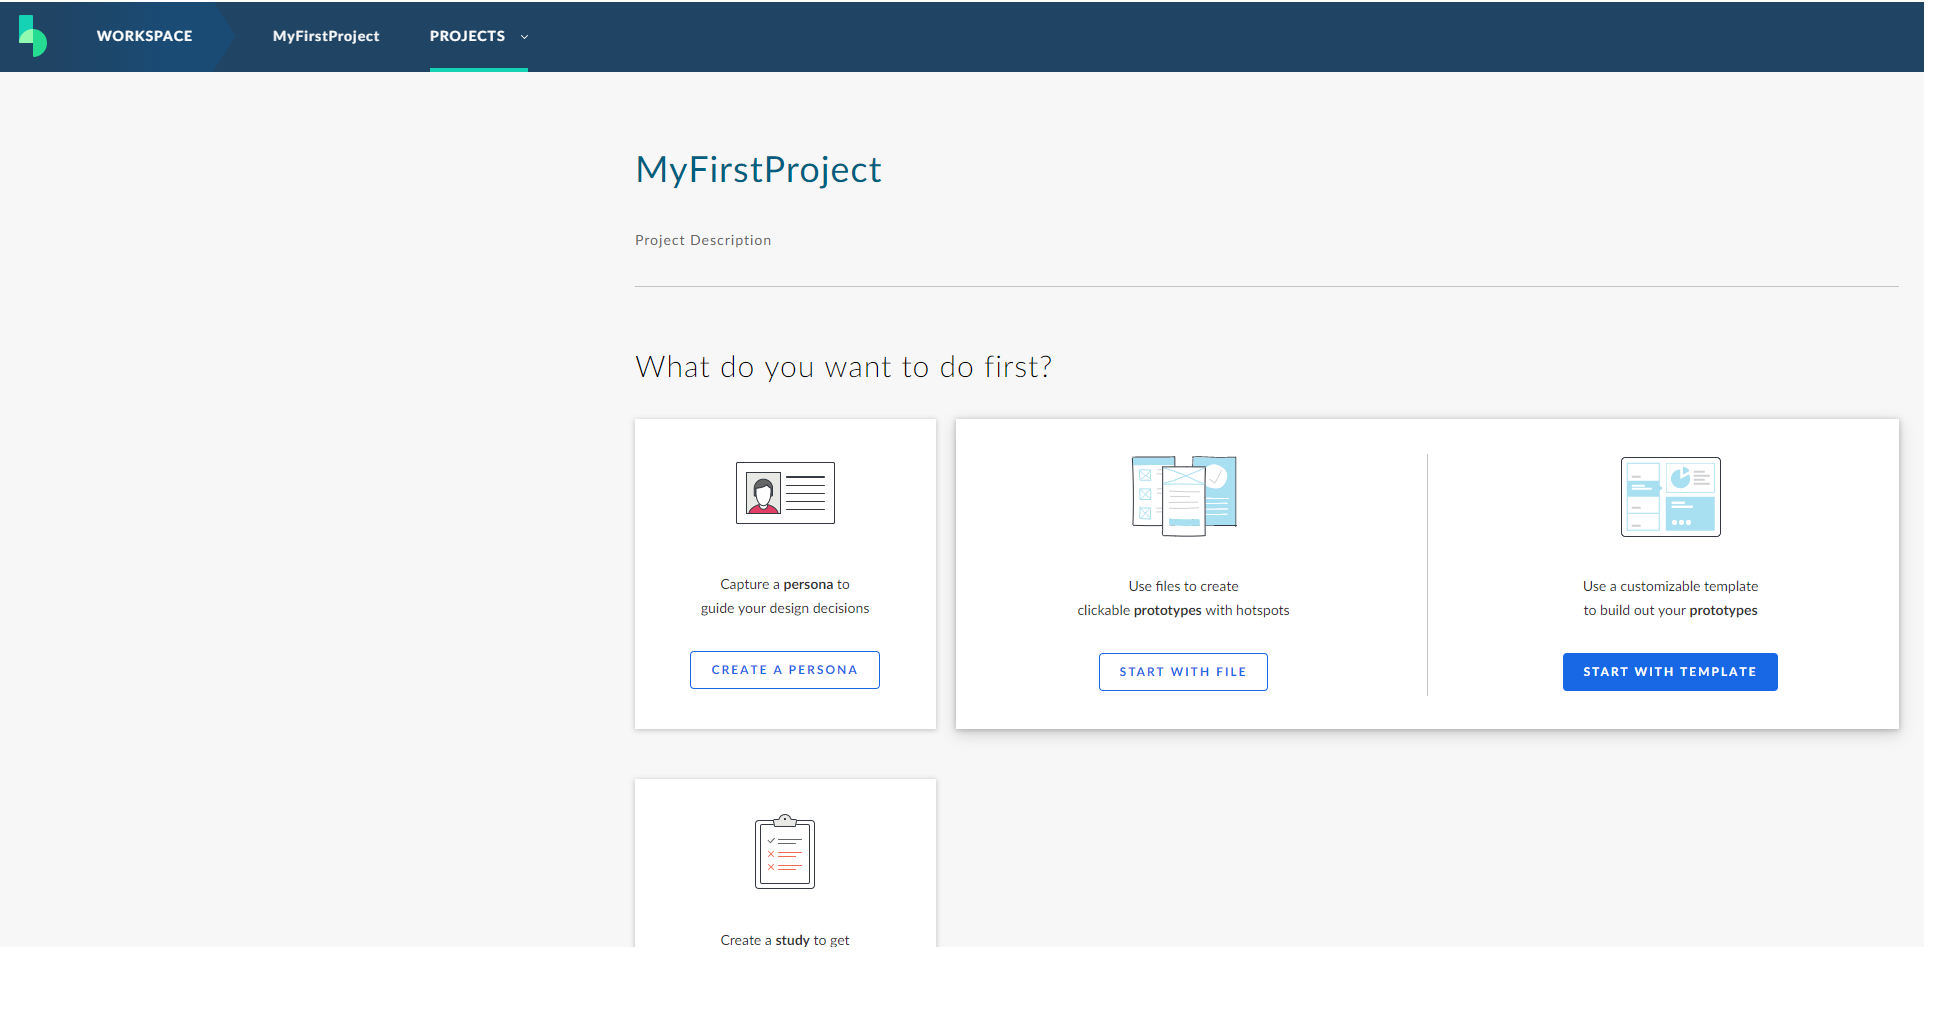 Hands on – Build a simple application with SAP BUILD, SAP Web IDE